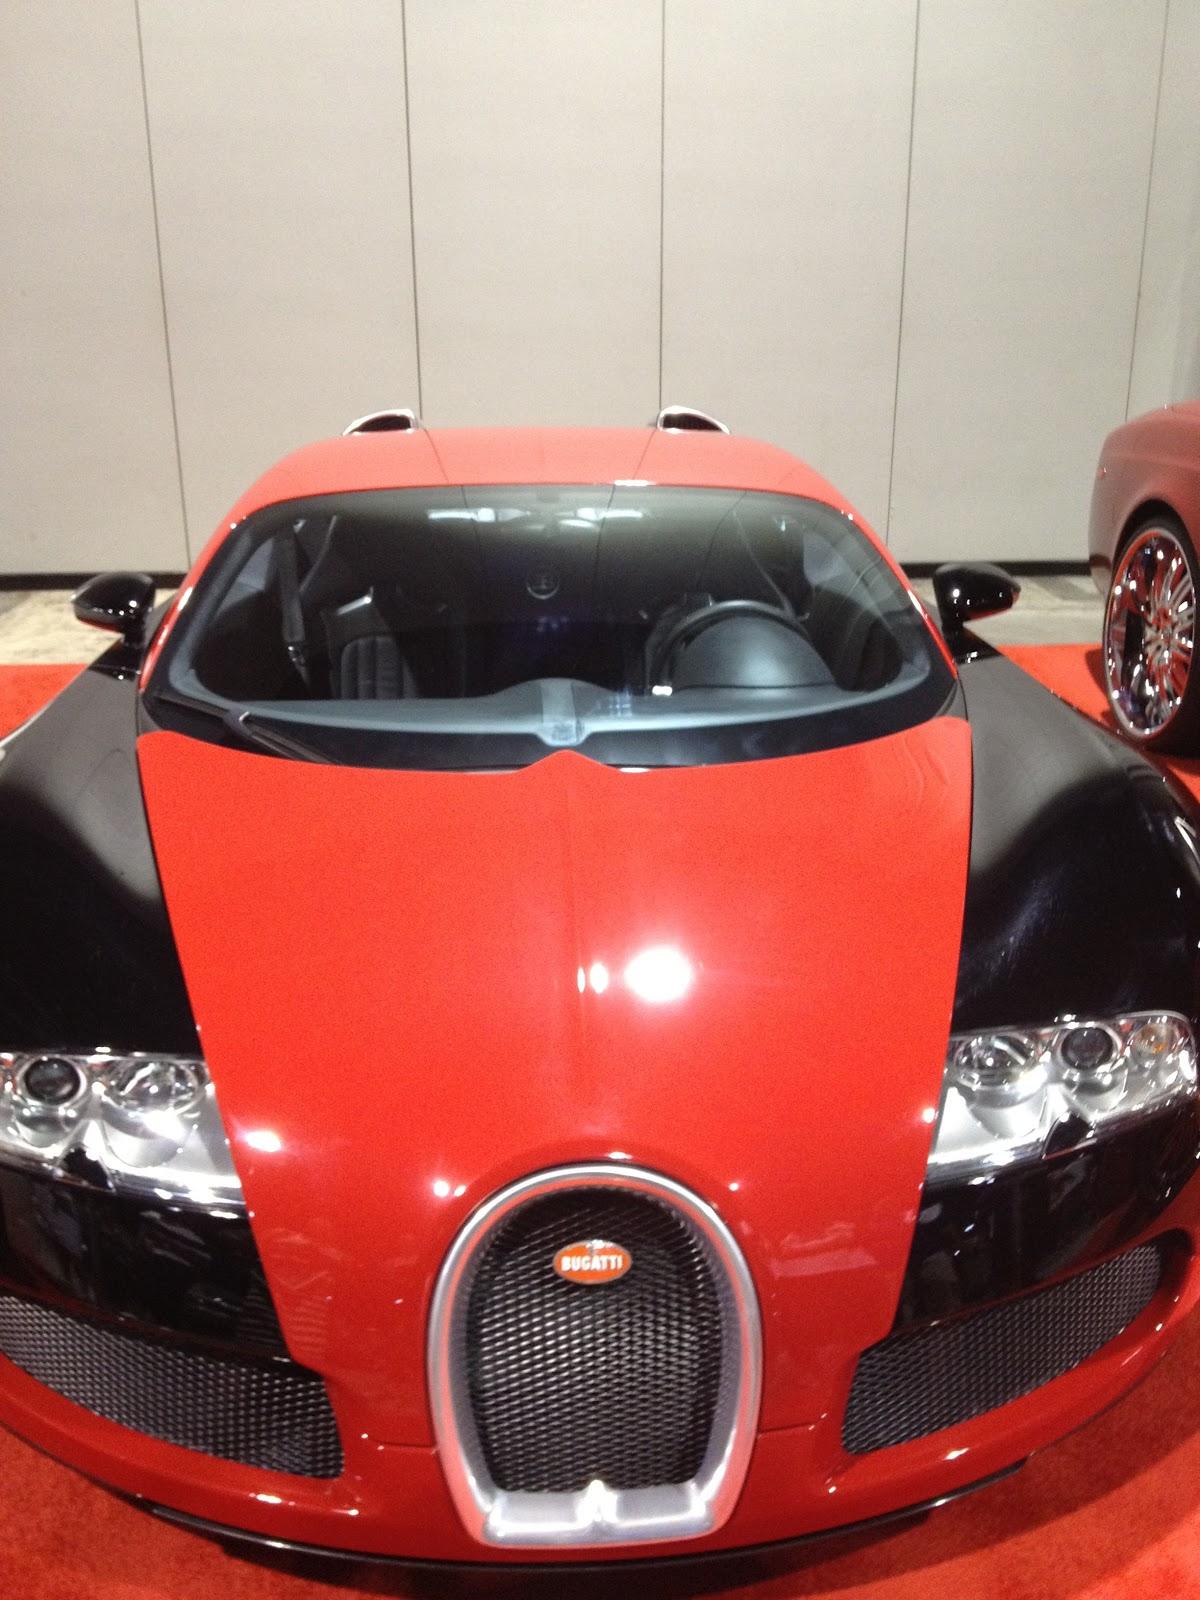 Sojourner Marable Grimmett The V Car Bike Show The - Car show world congress center atlanta